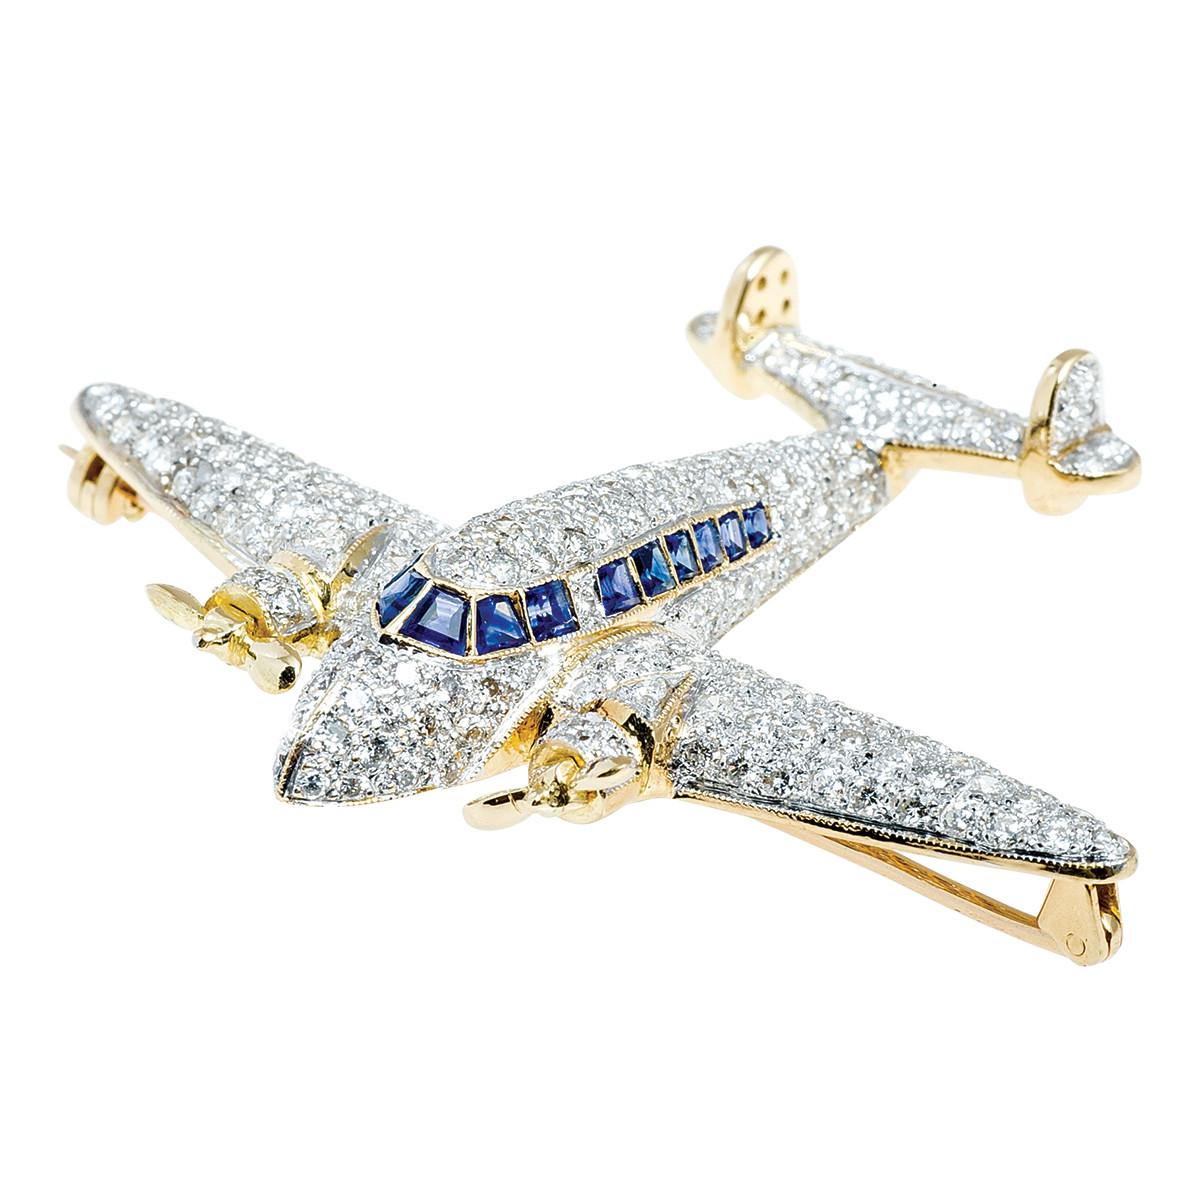 Vintage 2.28 CTW Diamond & Sapphire Airplane Brooch